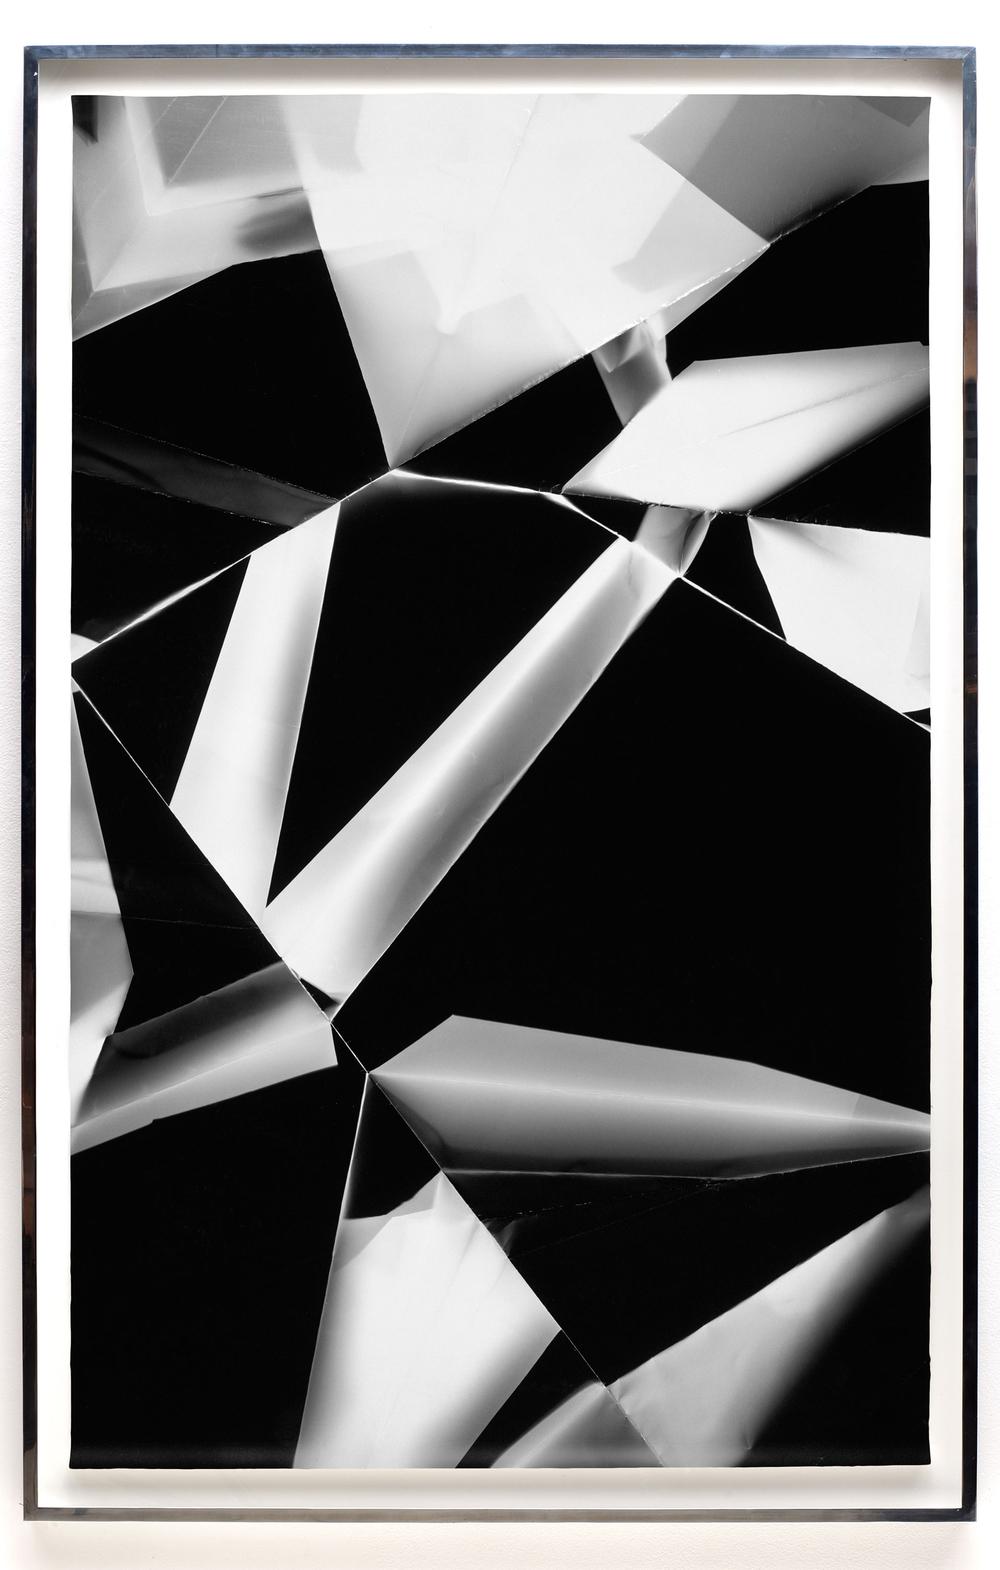 Fold (60º/120º/180º/240º/300º/360º directional light sources), June 5, 2008, Annandale-On-Hudson, New York, Foma Multigrade Fiber    2009   Black and white fiber based photographic paper  72 x 46 3/4 inches   Legibility on Color Backgrounds, 2009